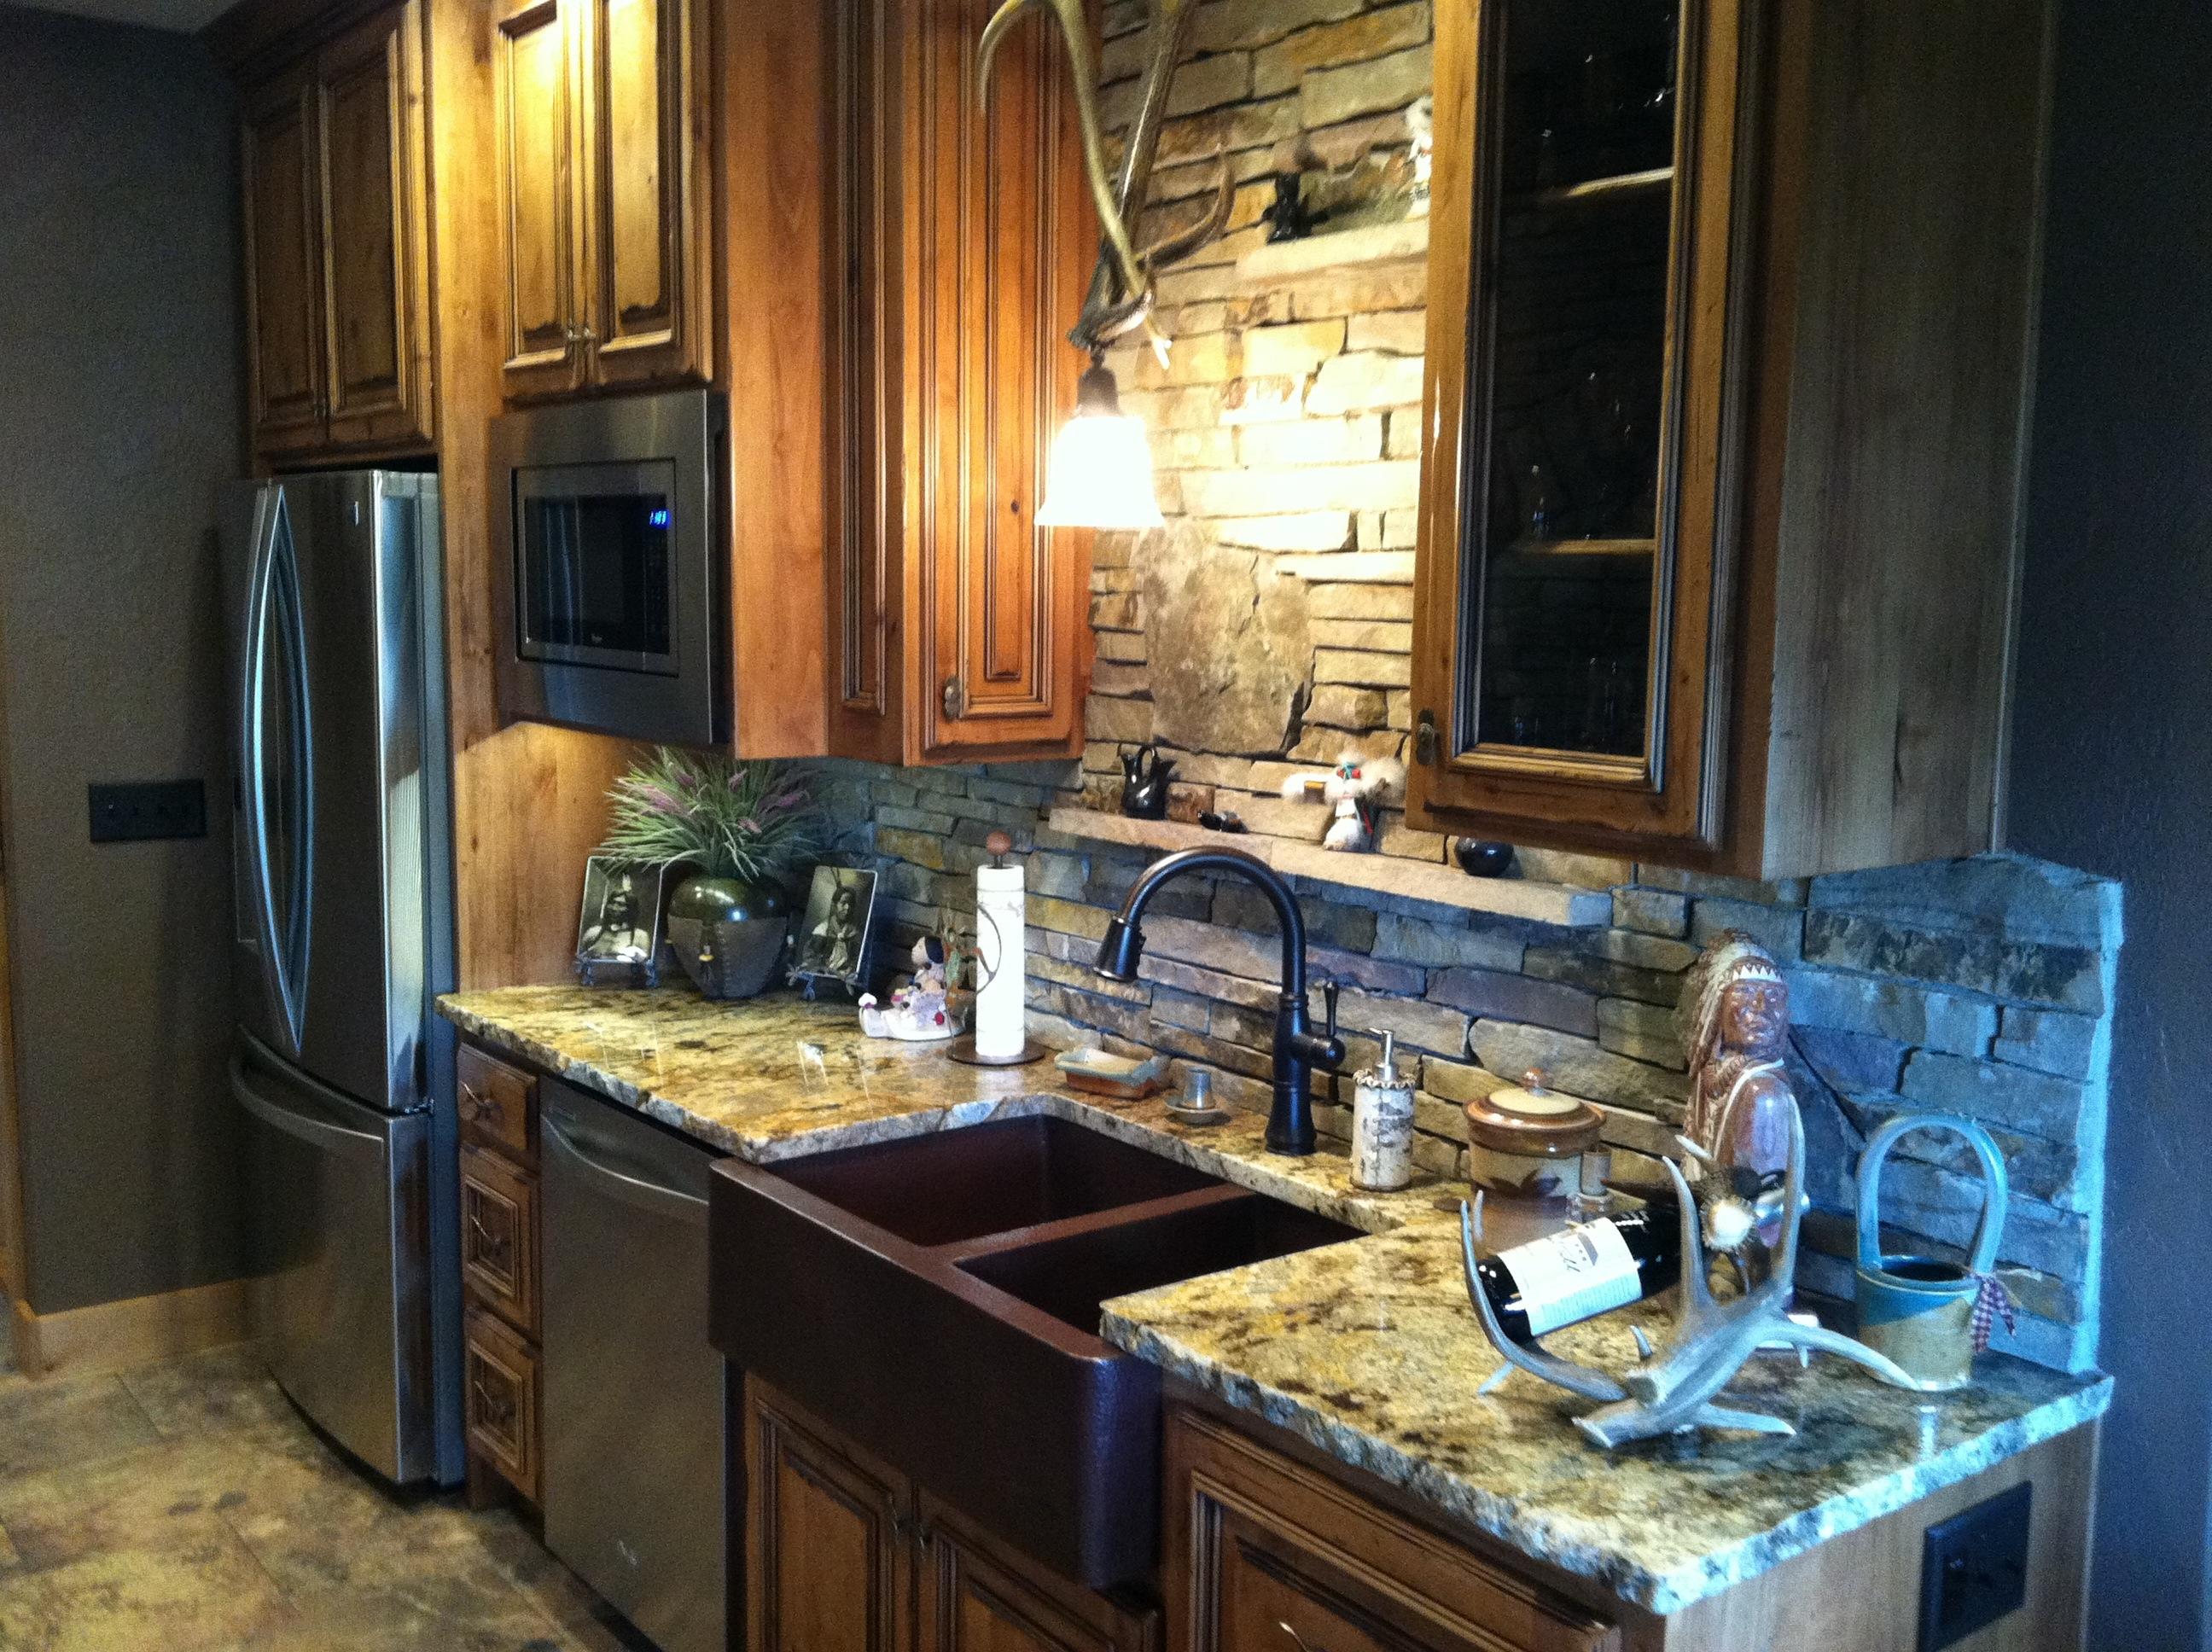 covey kitchen remodel beatrice ne kitchen remodeling lincoln ne Covey Kitchen Remodel Beatrice NE